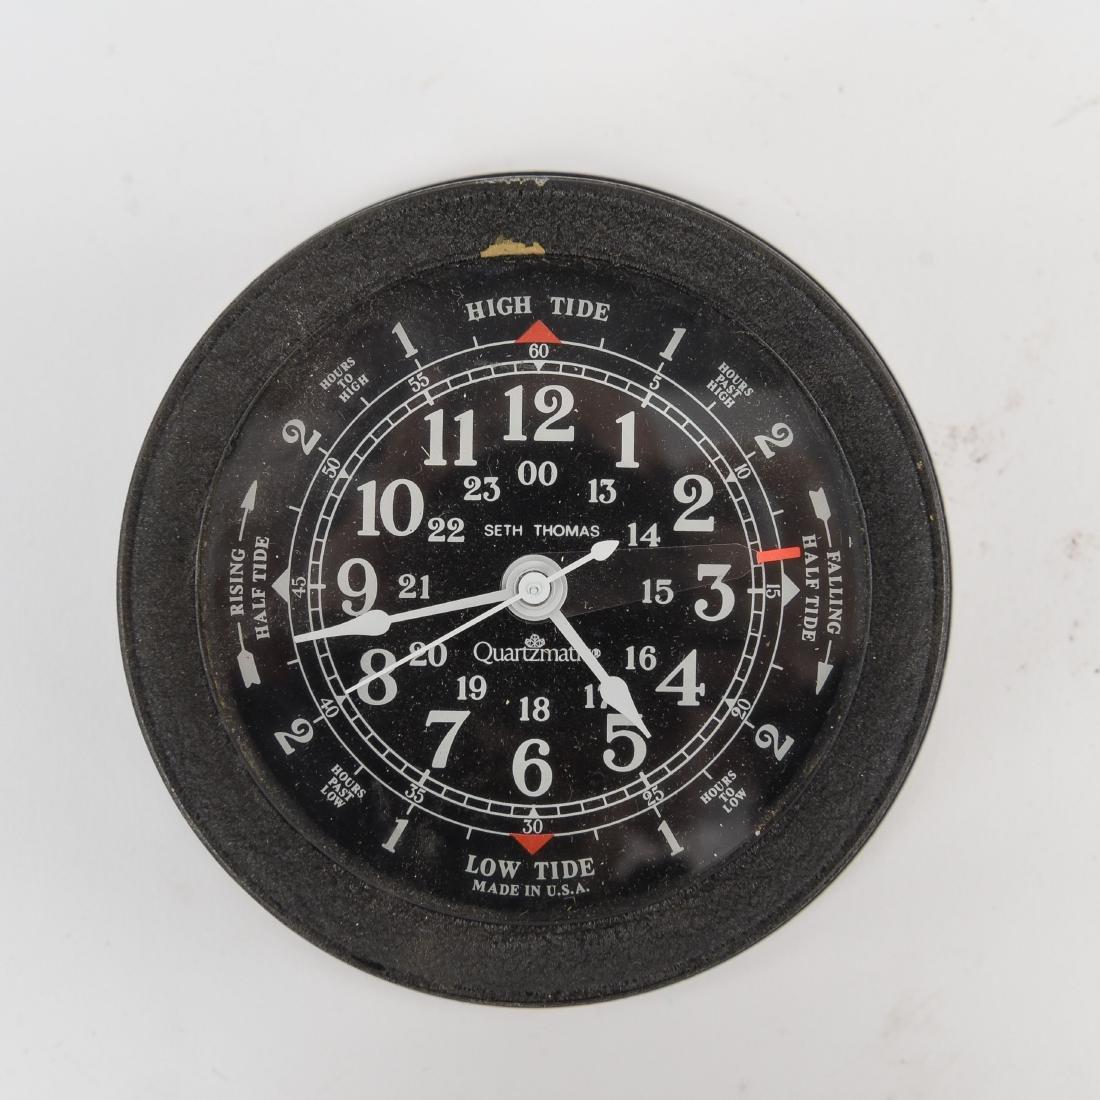 SETH THOMAS TIME/TIDE COMBINATION CLOCK